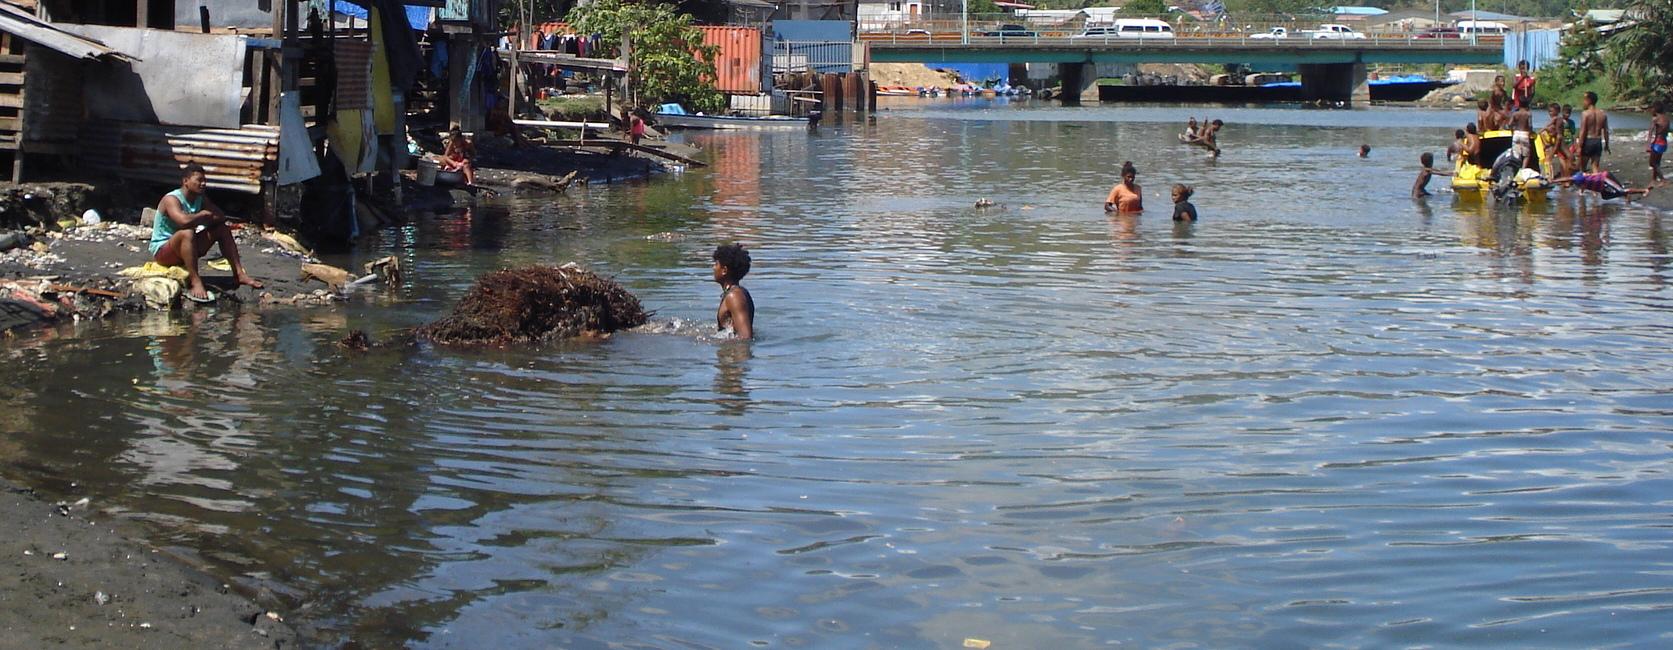 Lord Howe Settlement on the Mataniko River, Honiara (Photo: Catherine Wilson)